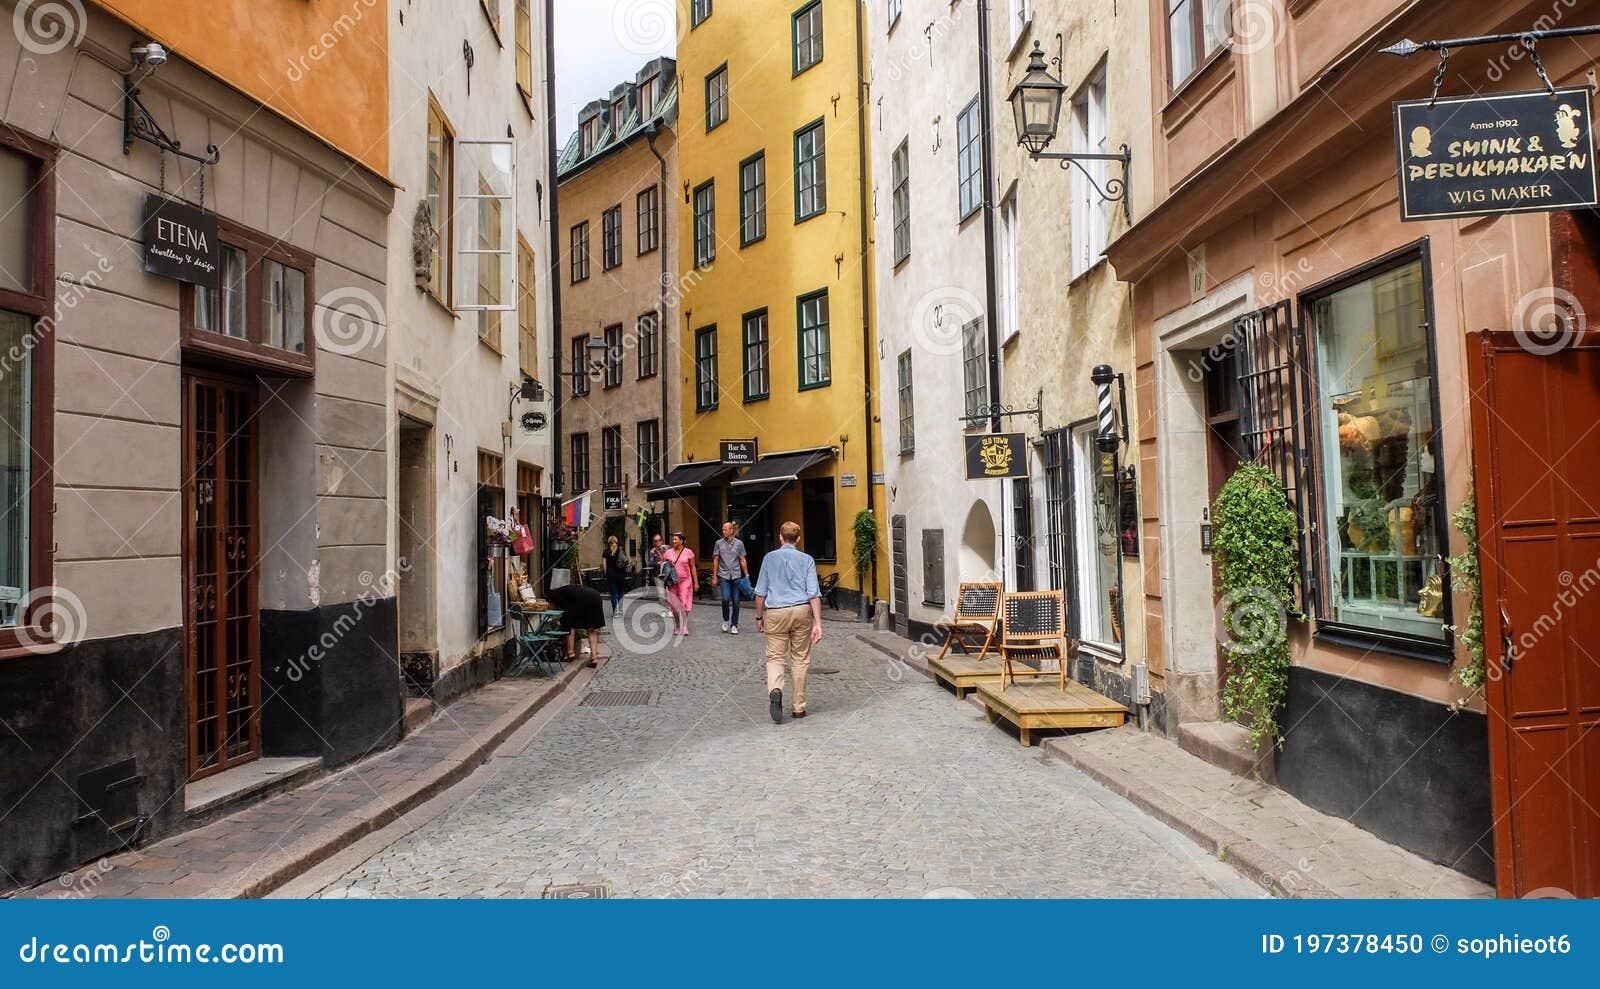 dating sweden gamla stan)